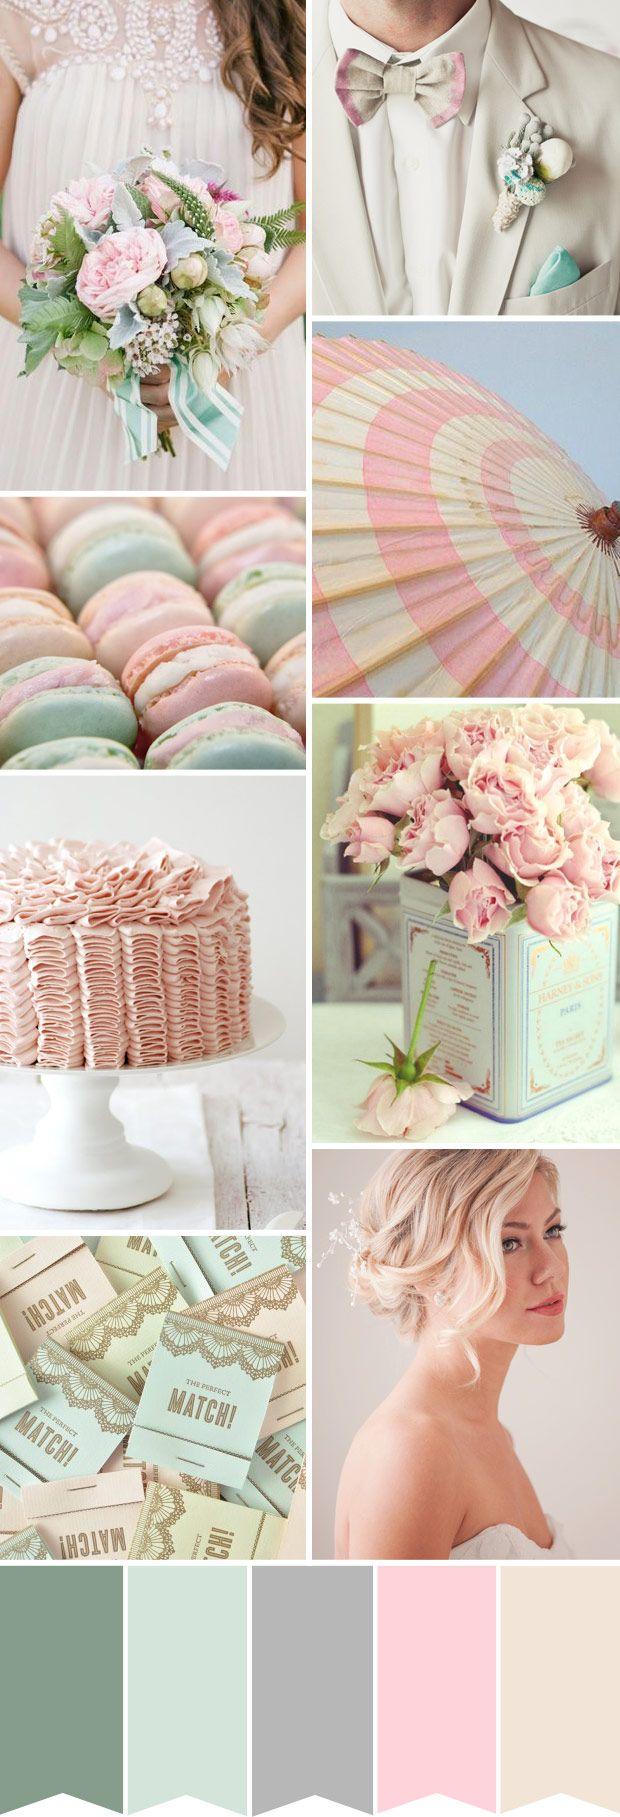 Pretty Pastels Wedding Palette  Powder Pink and Duck Egg Blue